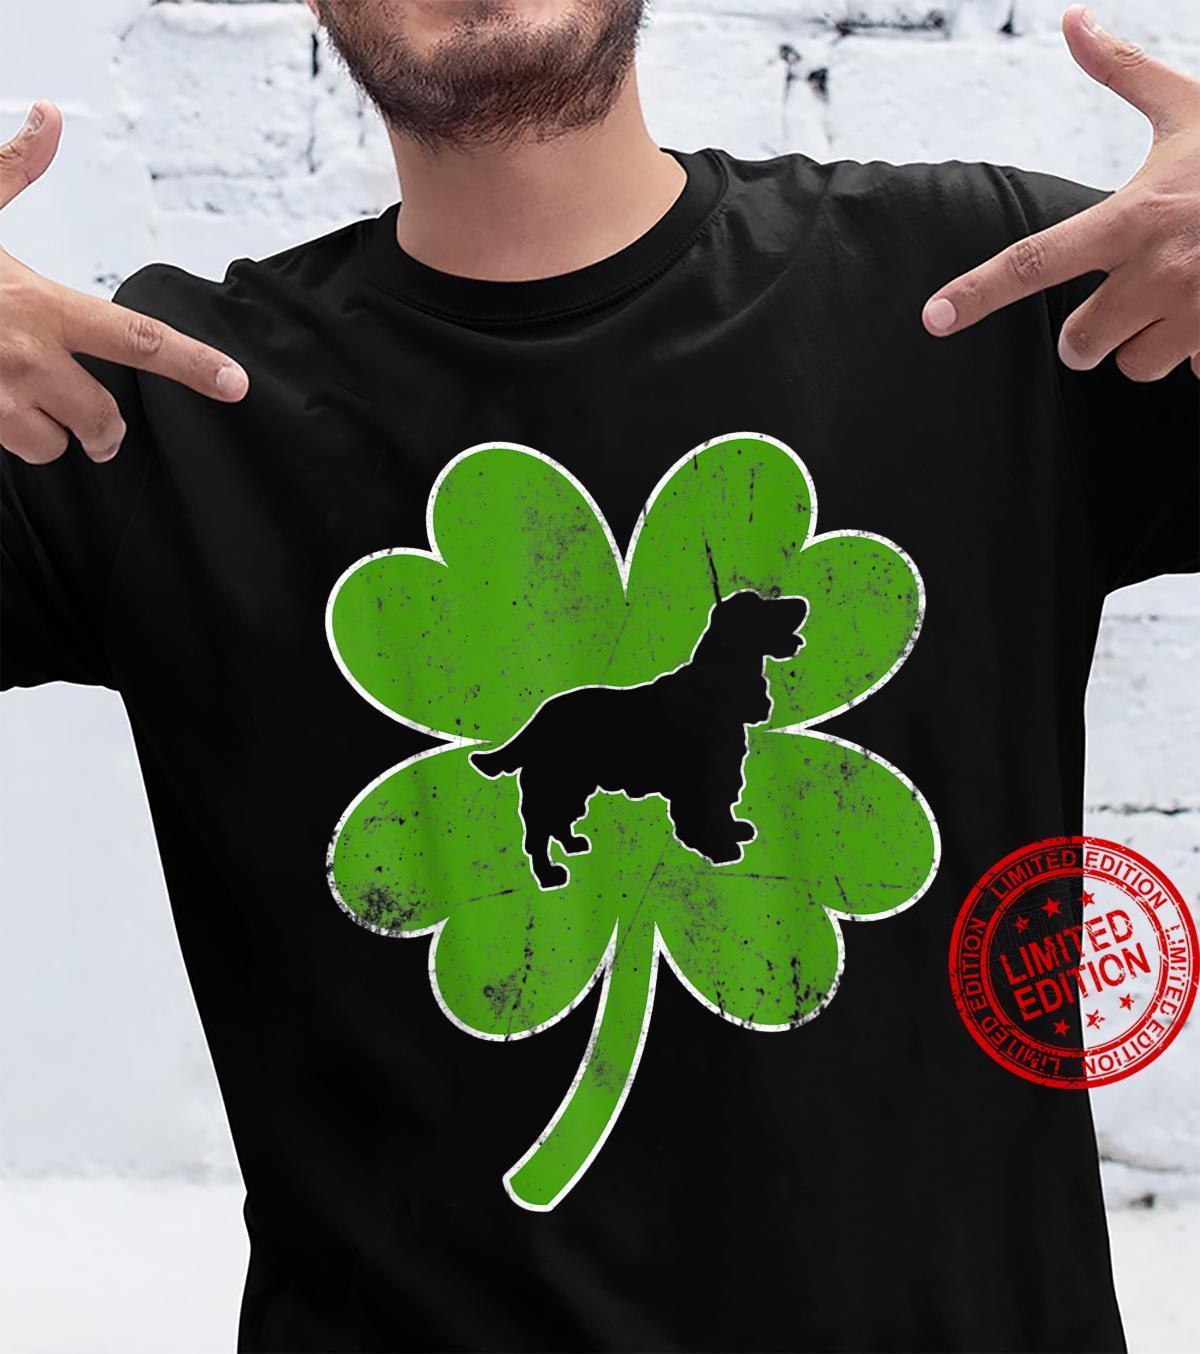 Cocker Spaniel Dog Shamrock St. Patrick's Day Irish Shirt